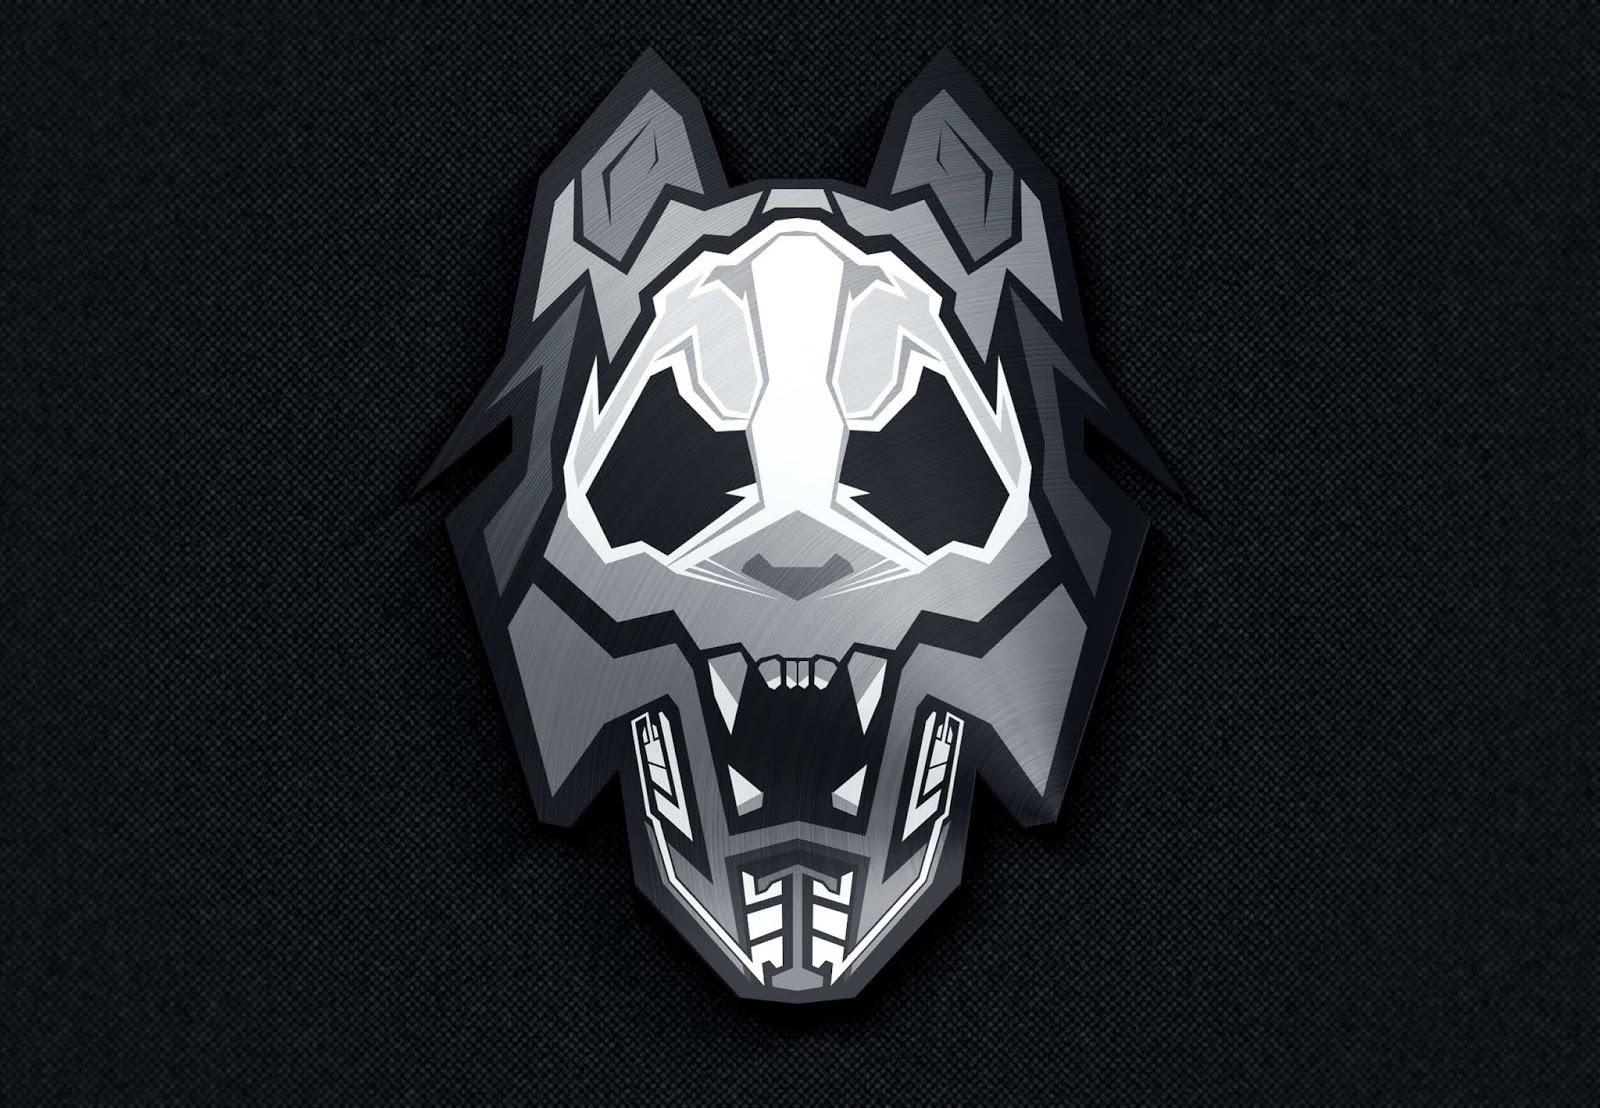 elusive gaming logo design virtual makes